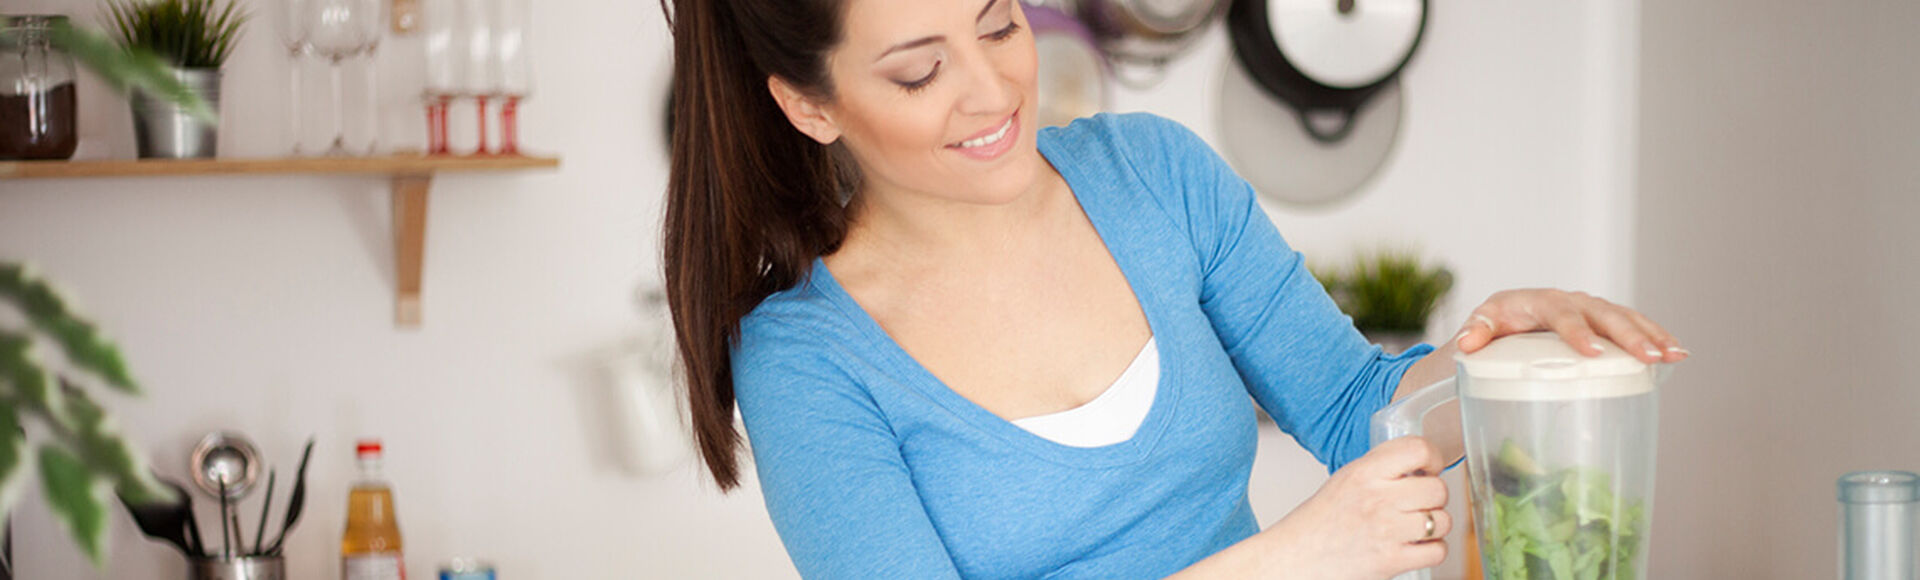 Nutrição vegetariana na gravidez